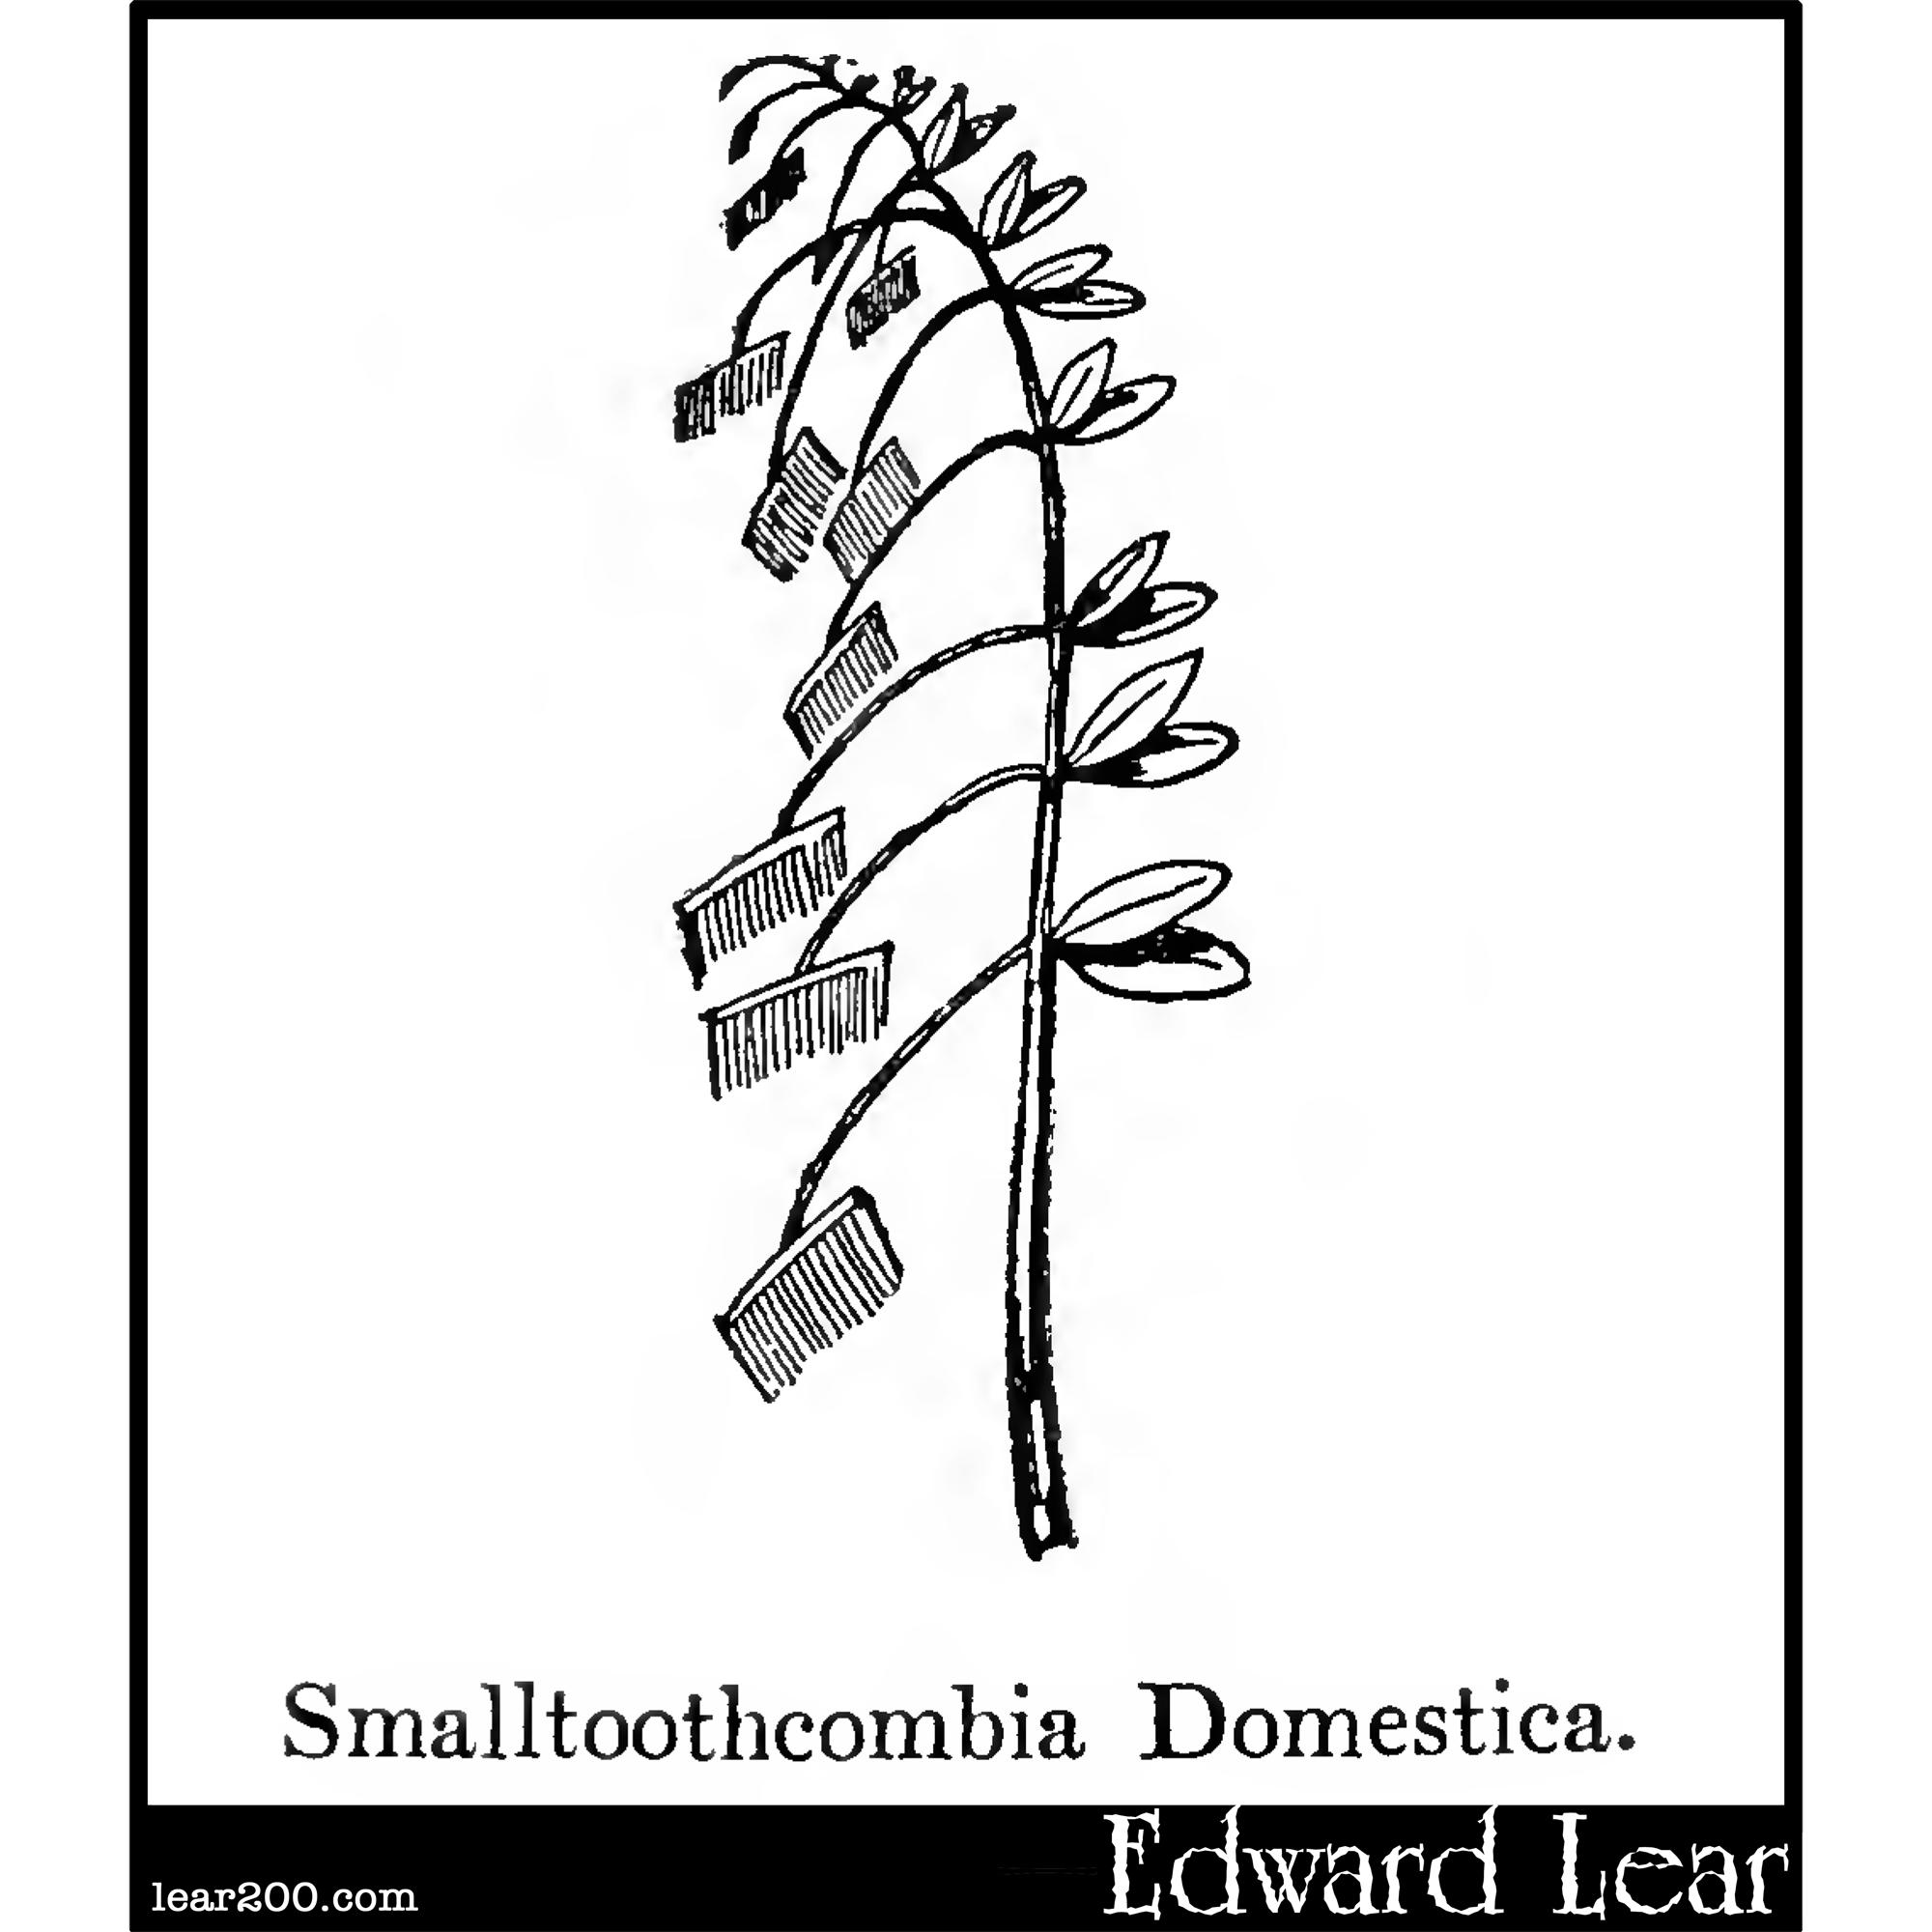 Smalltoothcombia Domestica